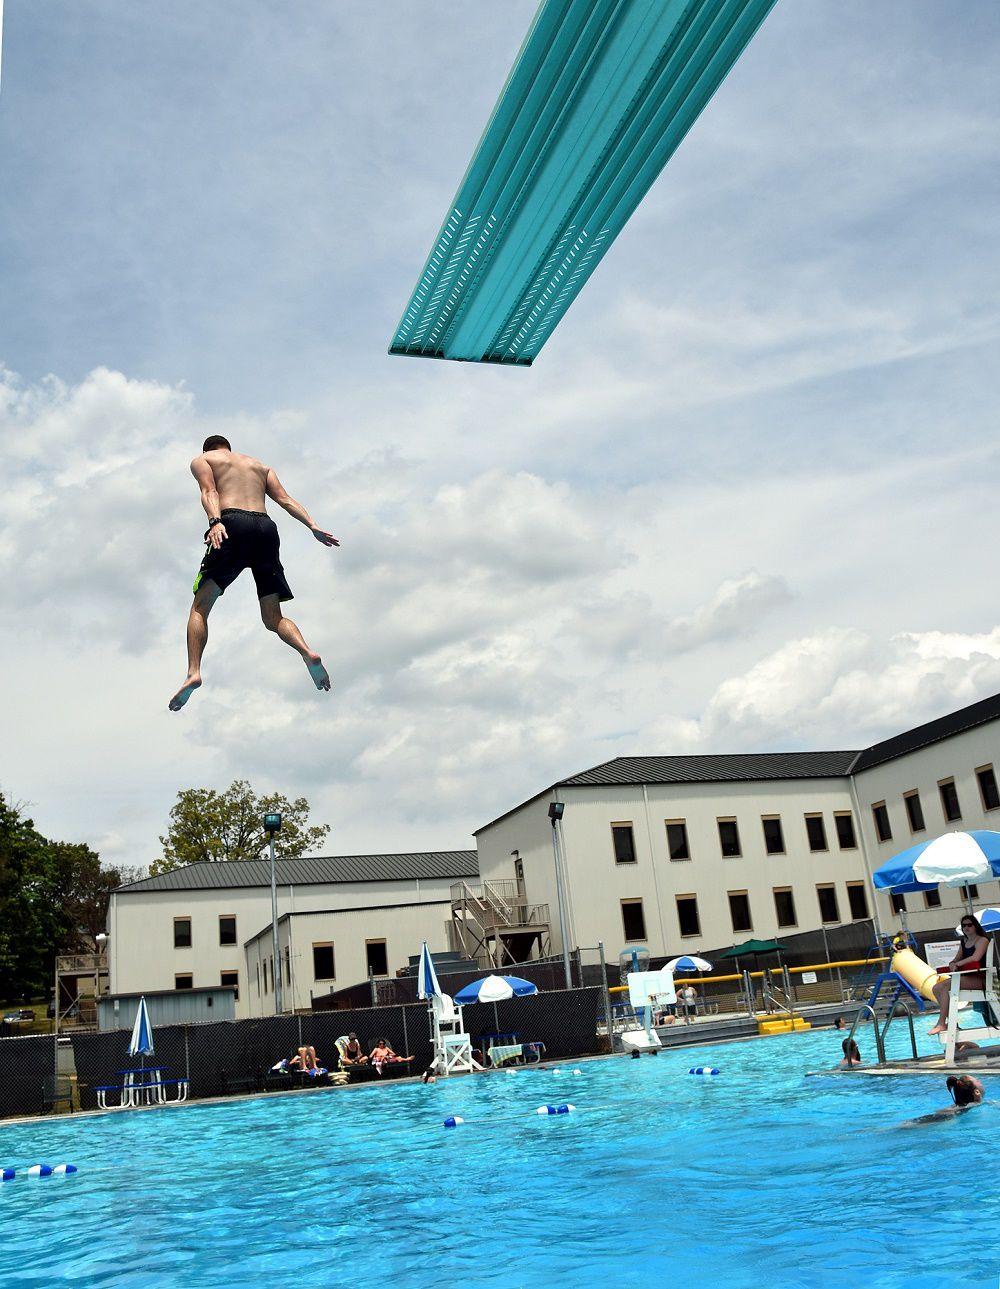 Swimming pool 1 boy dives.jpg